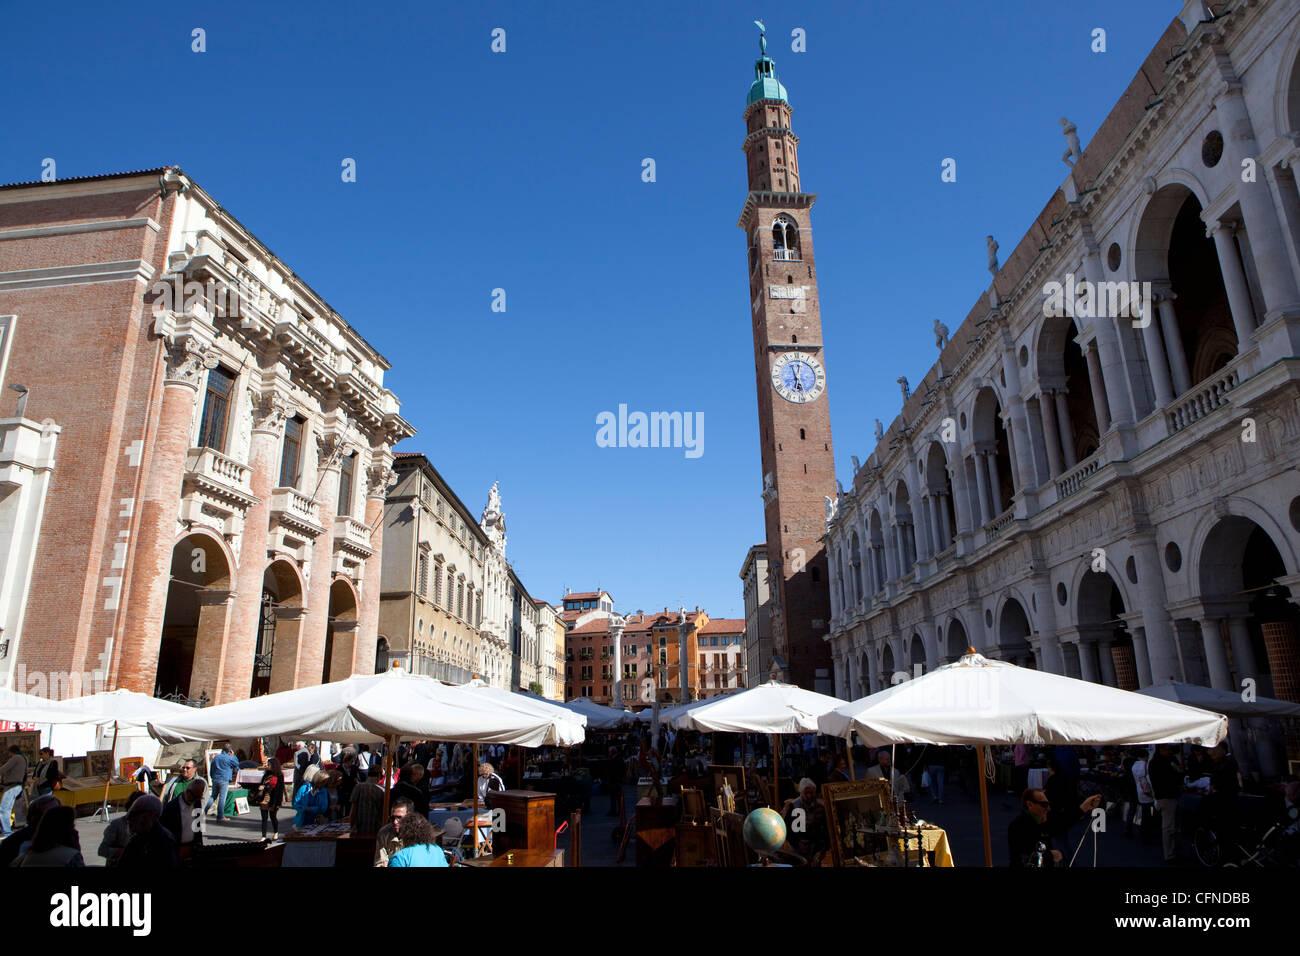 Piazza dei Signori and the Bissara tower, Vicenza, Veneto, Italy, Europe - Stock Image